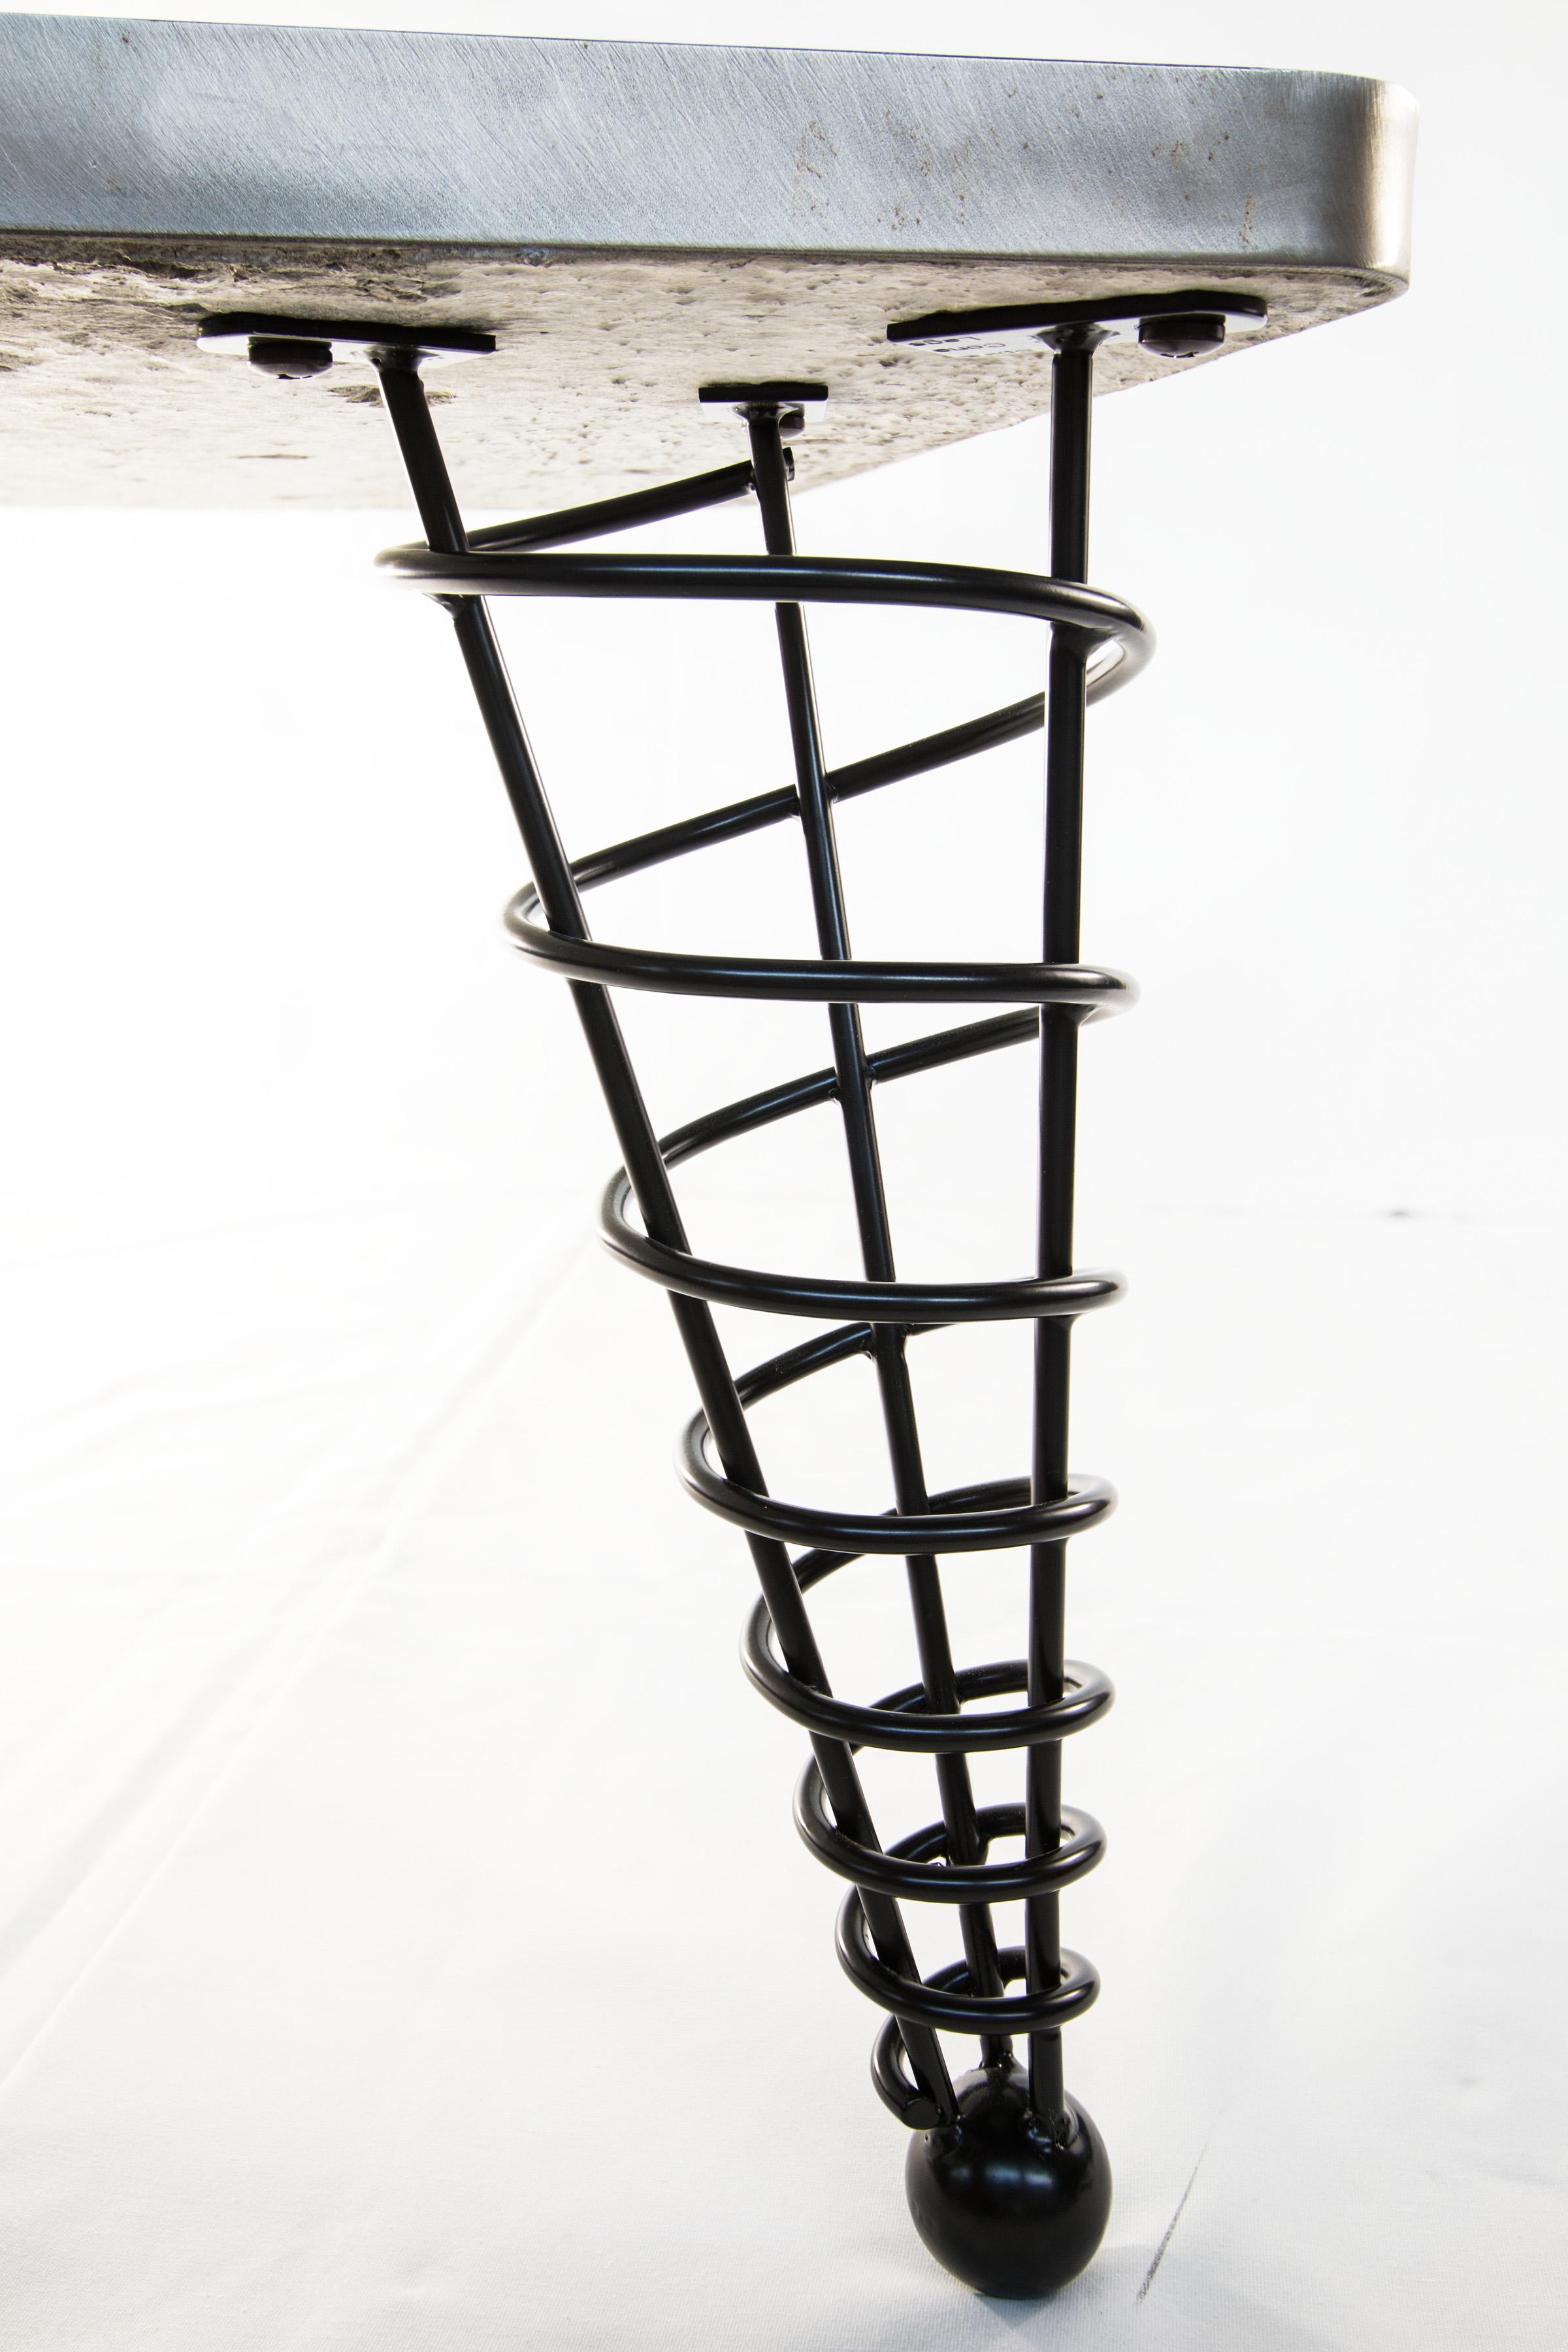 Modern table legs tyson benard design art fabrication midcentury modern table legs 14 inch height angled suitable for coffee table geotapseo Choice Image